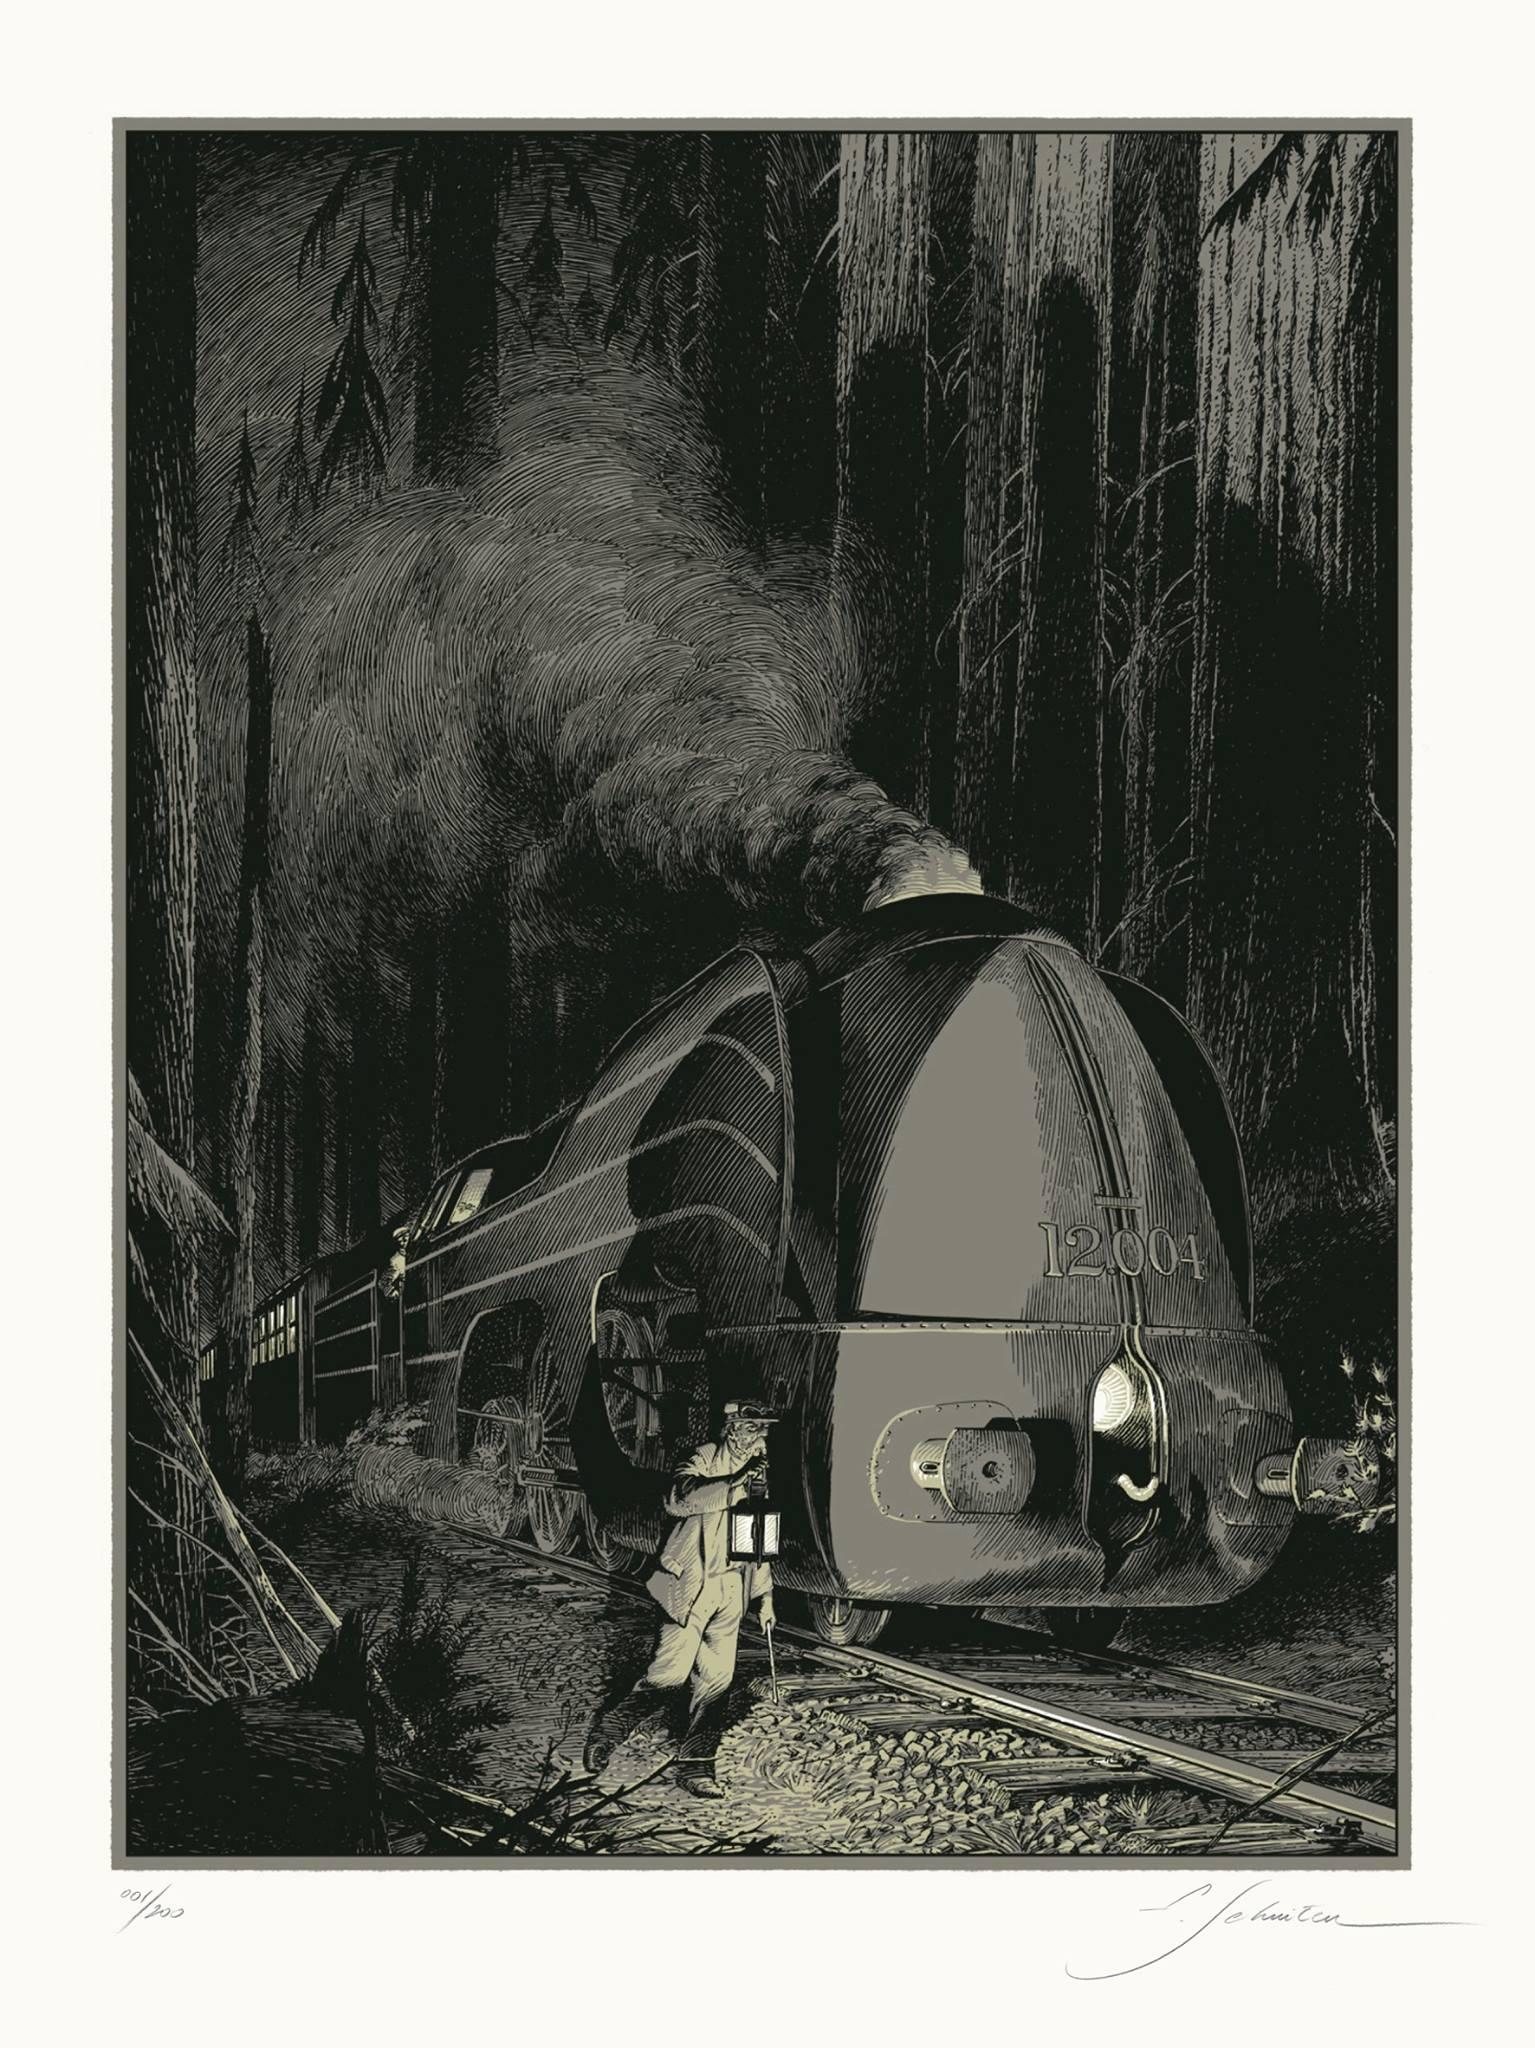 La Type 12 - Halte en forêt by François Schuiten